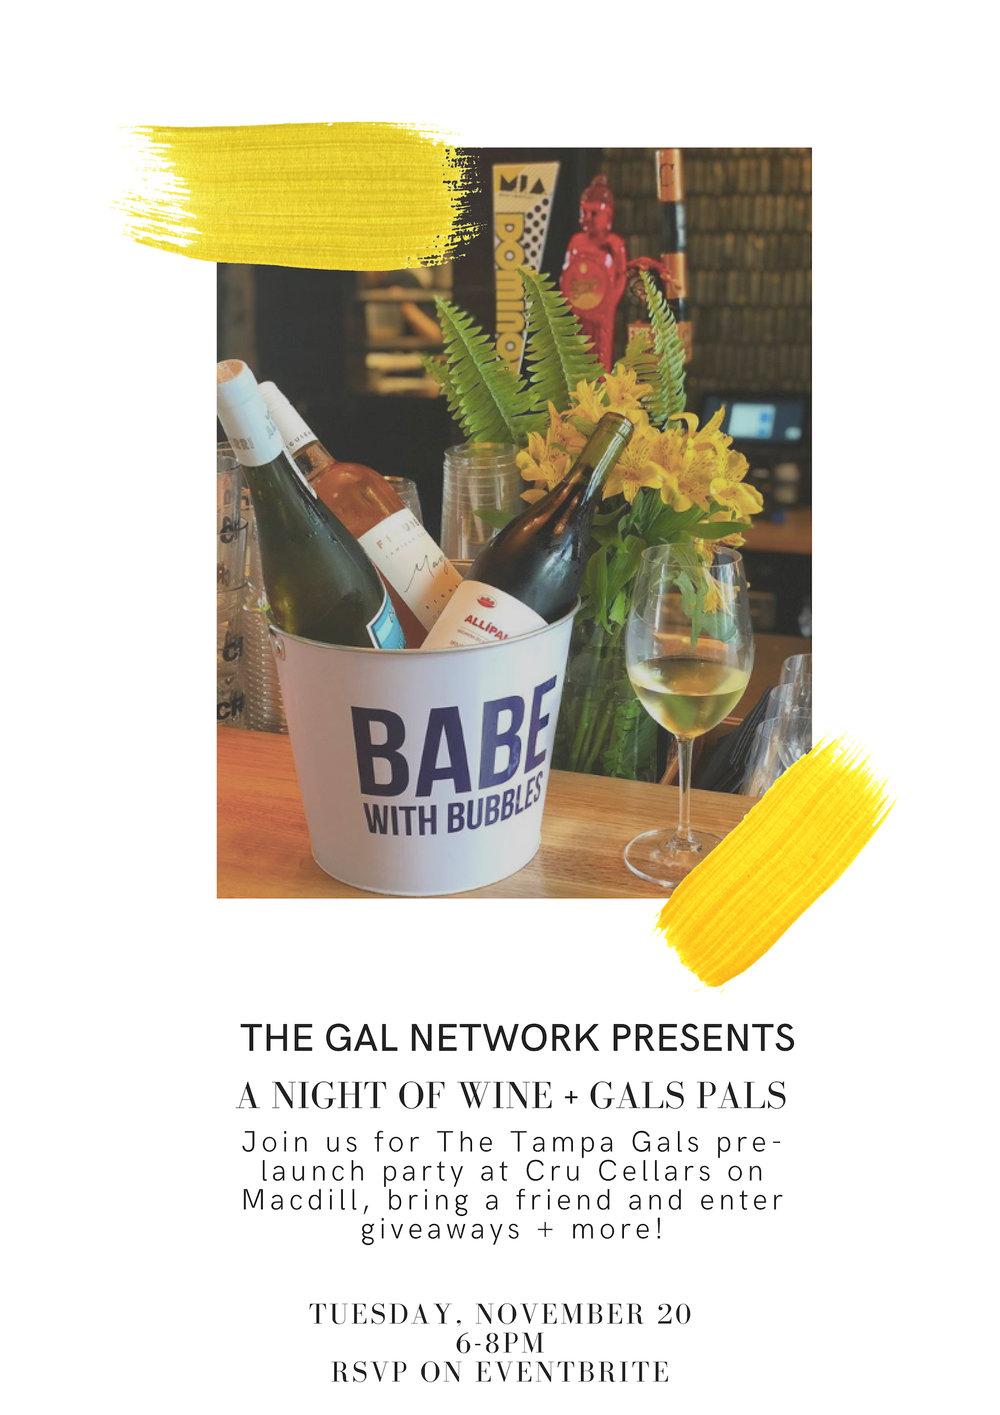 THE NASH GALS NETWORK PRESENTS (2).jpg